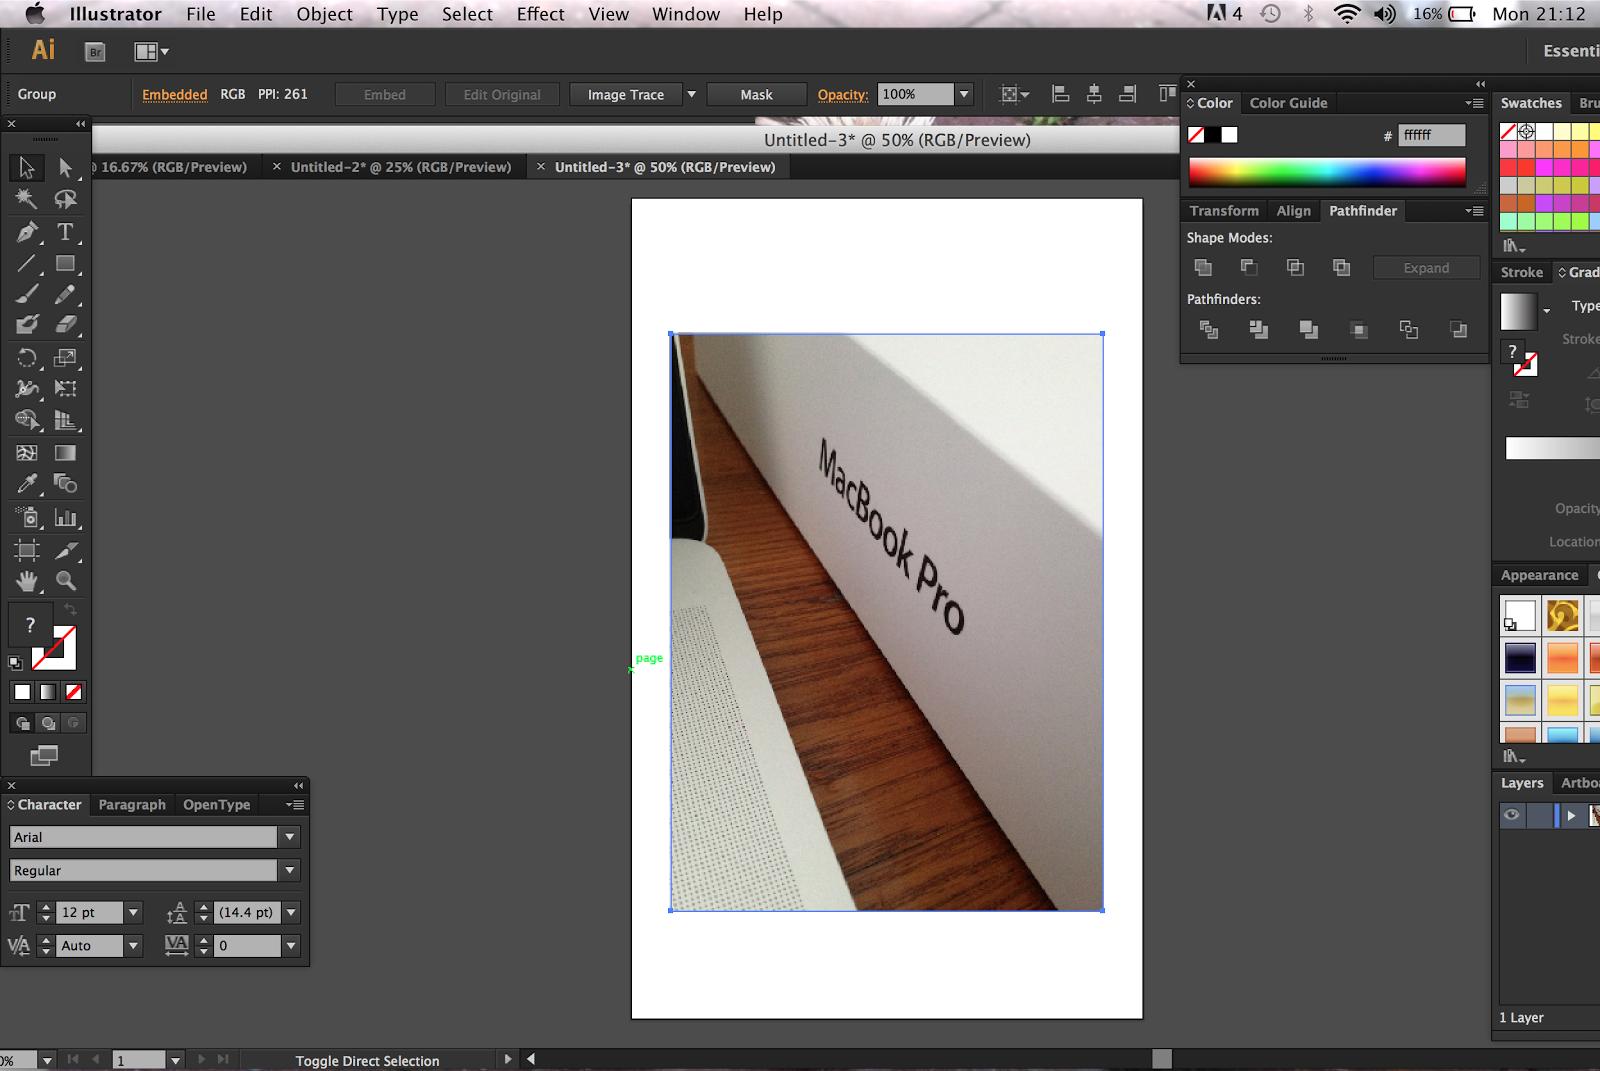 Illustrator & Photoshop Tutorials: Using the Image Trace